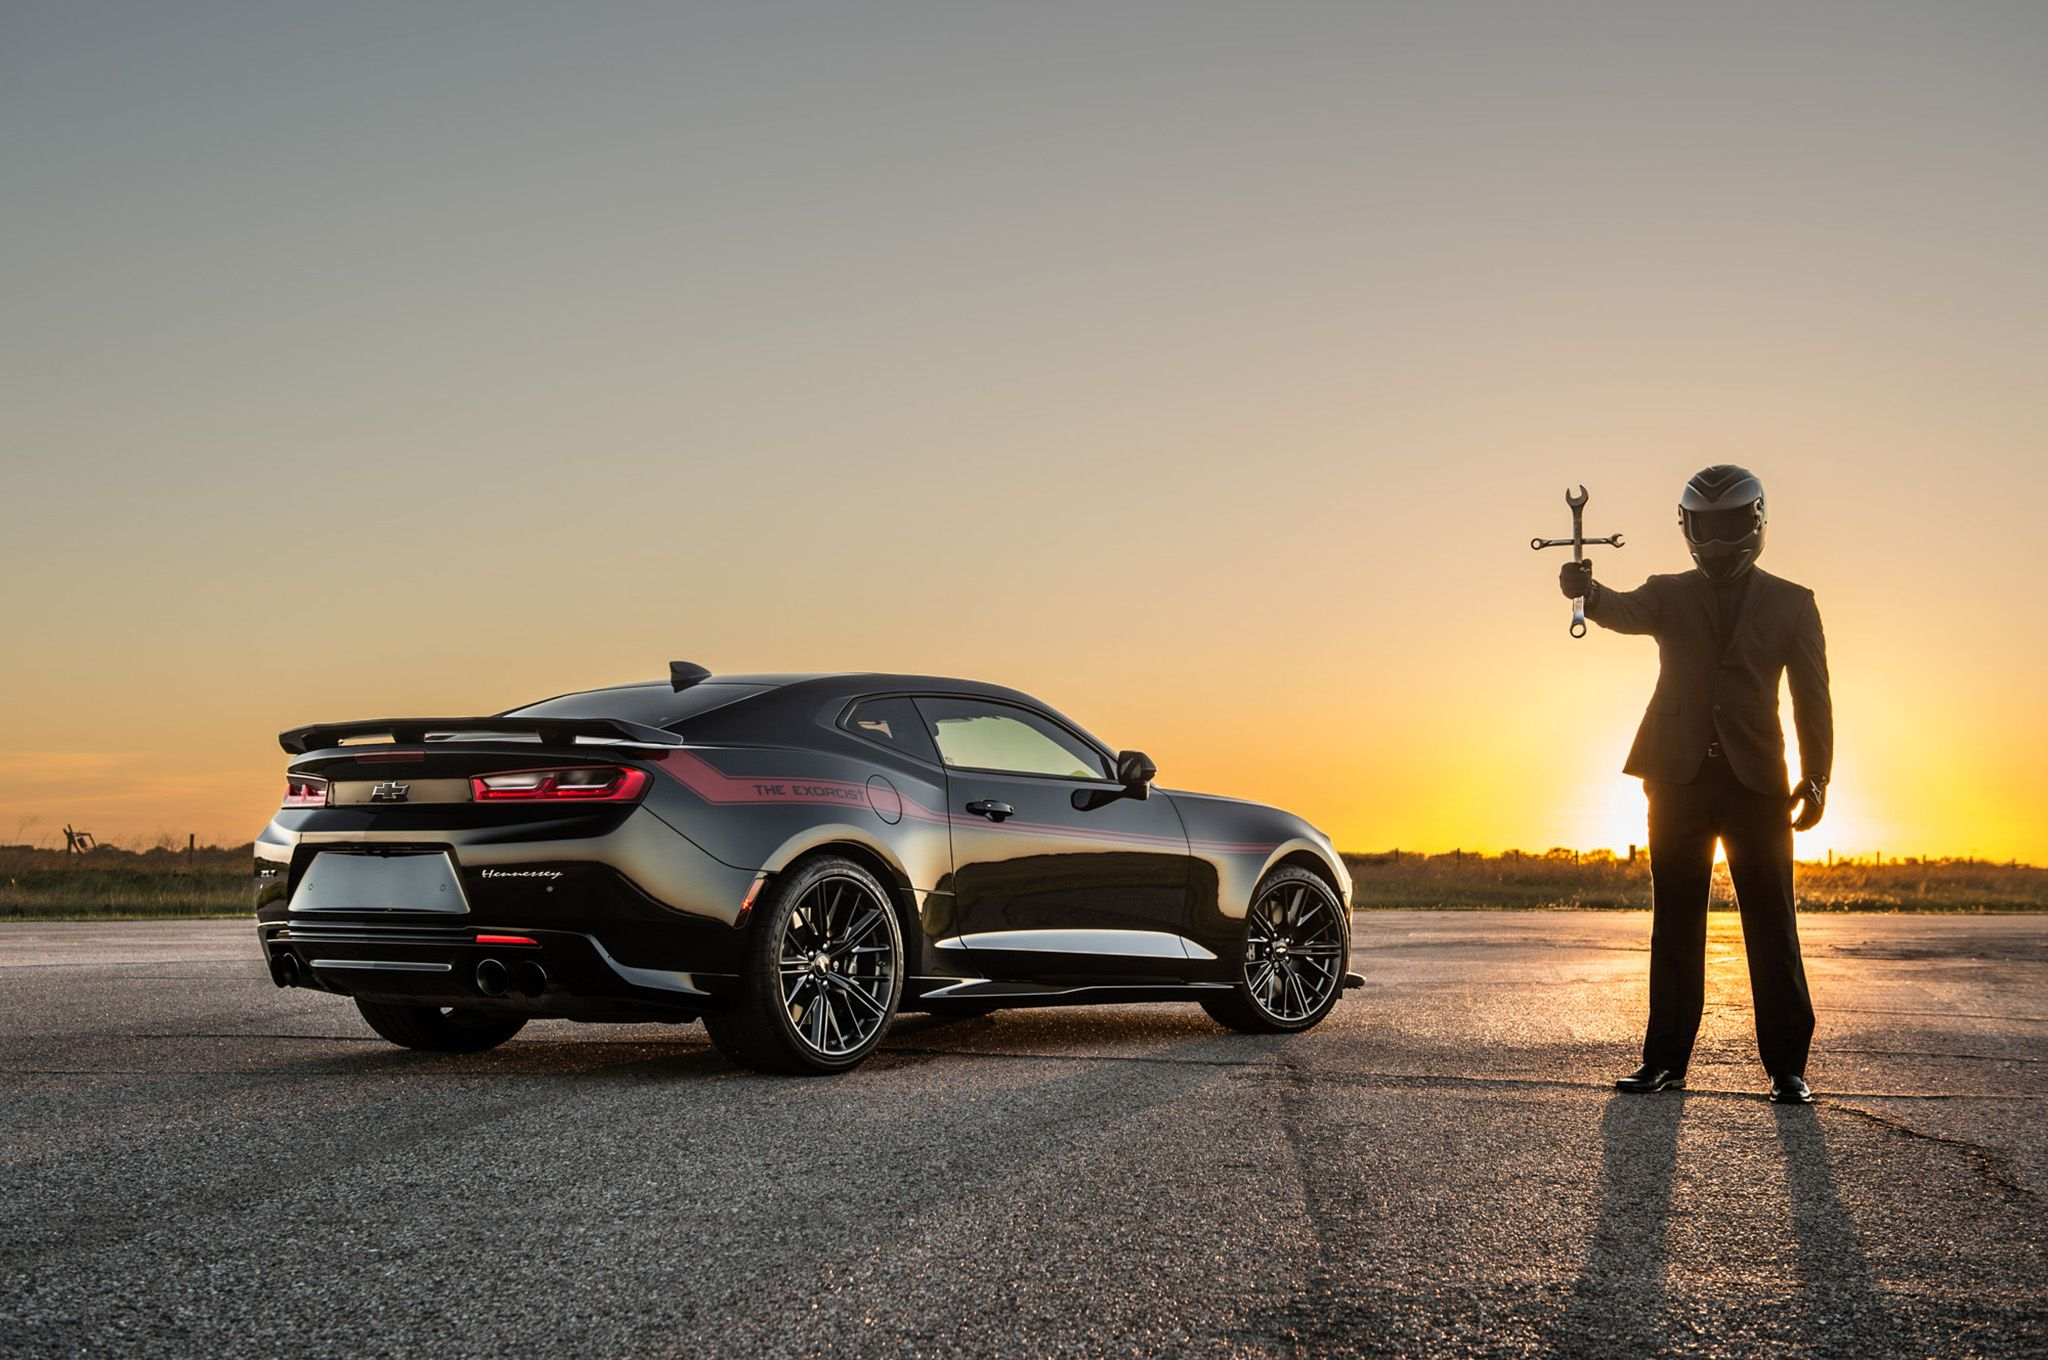 Hennessey S New Exorcist Chevrolet Camaro Zl1 Set To Terrorize